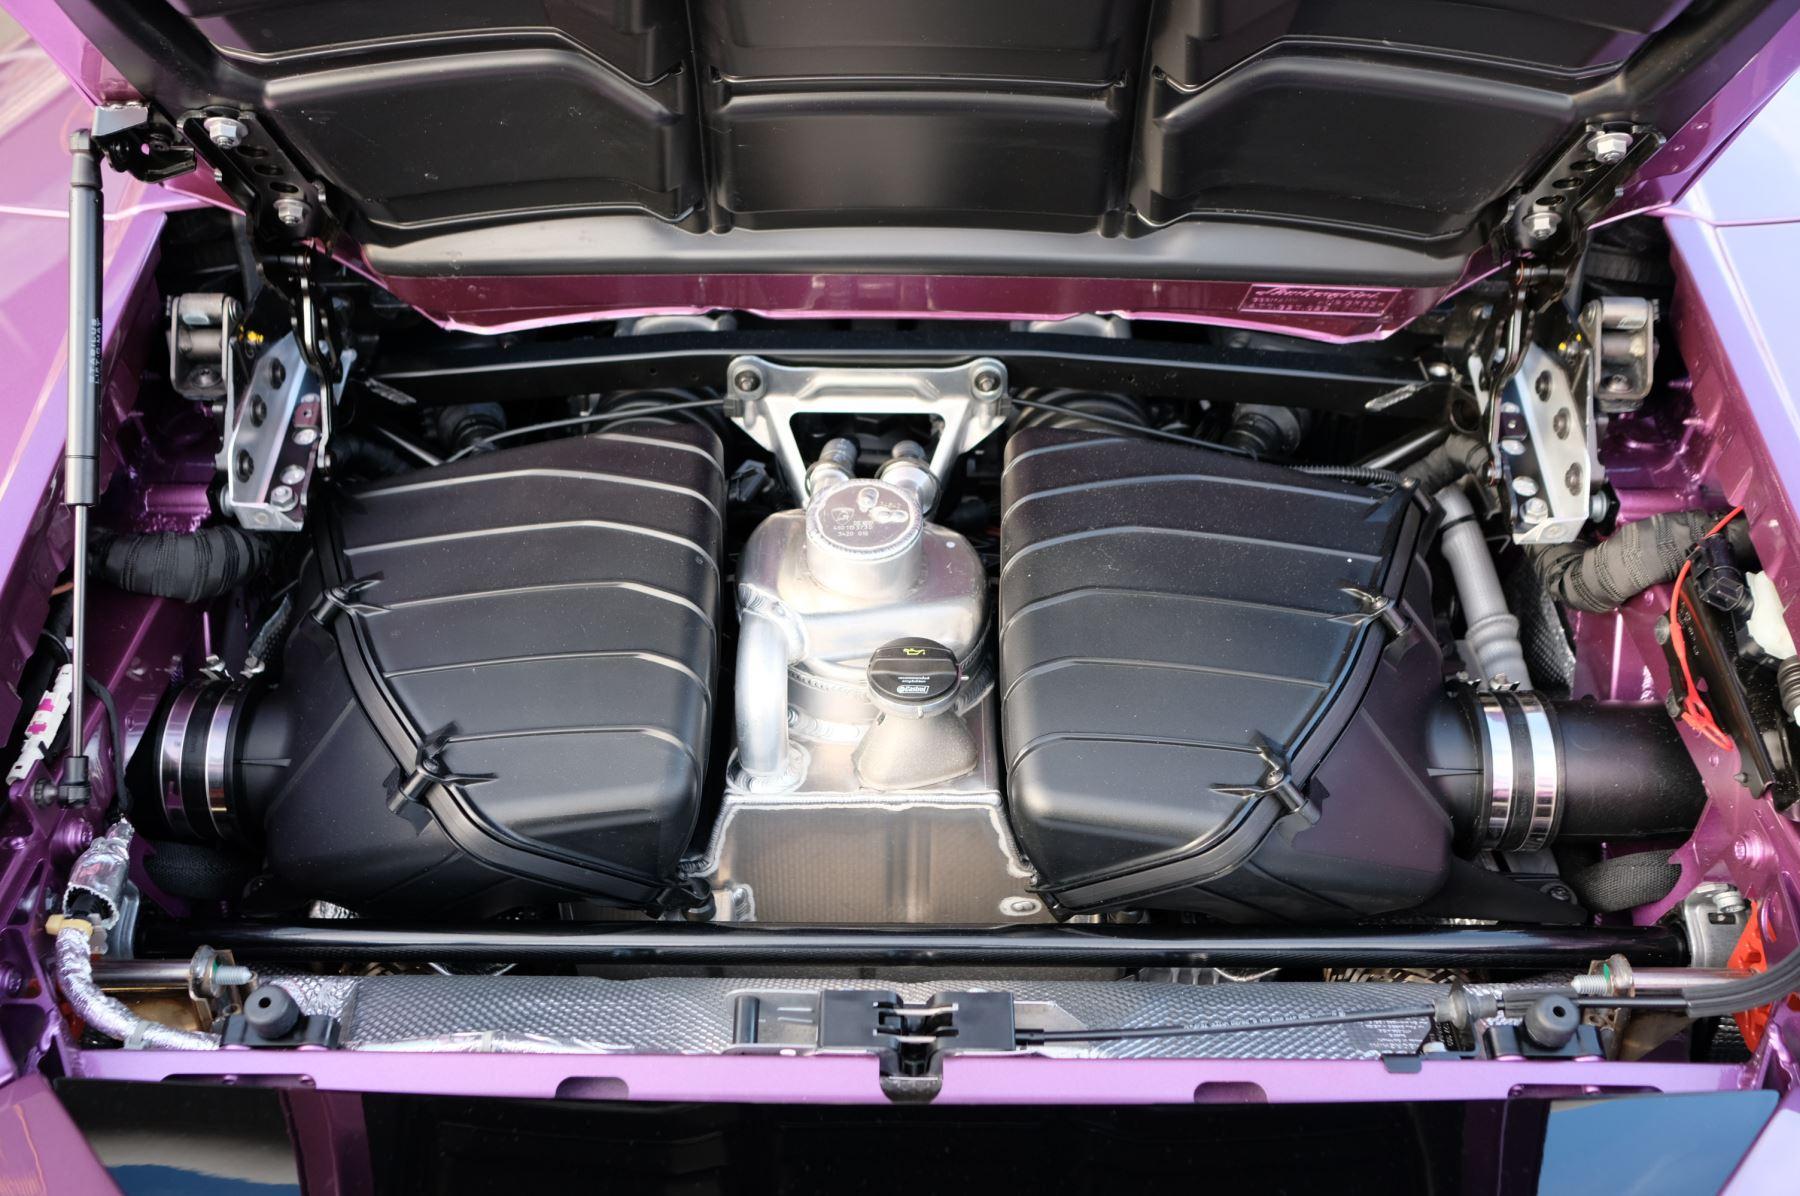 Lamborghini Huracan EVO Spyder 5.2 V10 640 2dr Auto AWD image 8